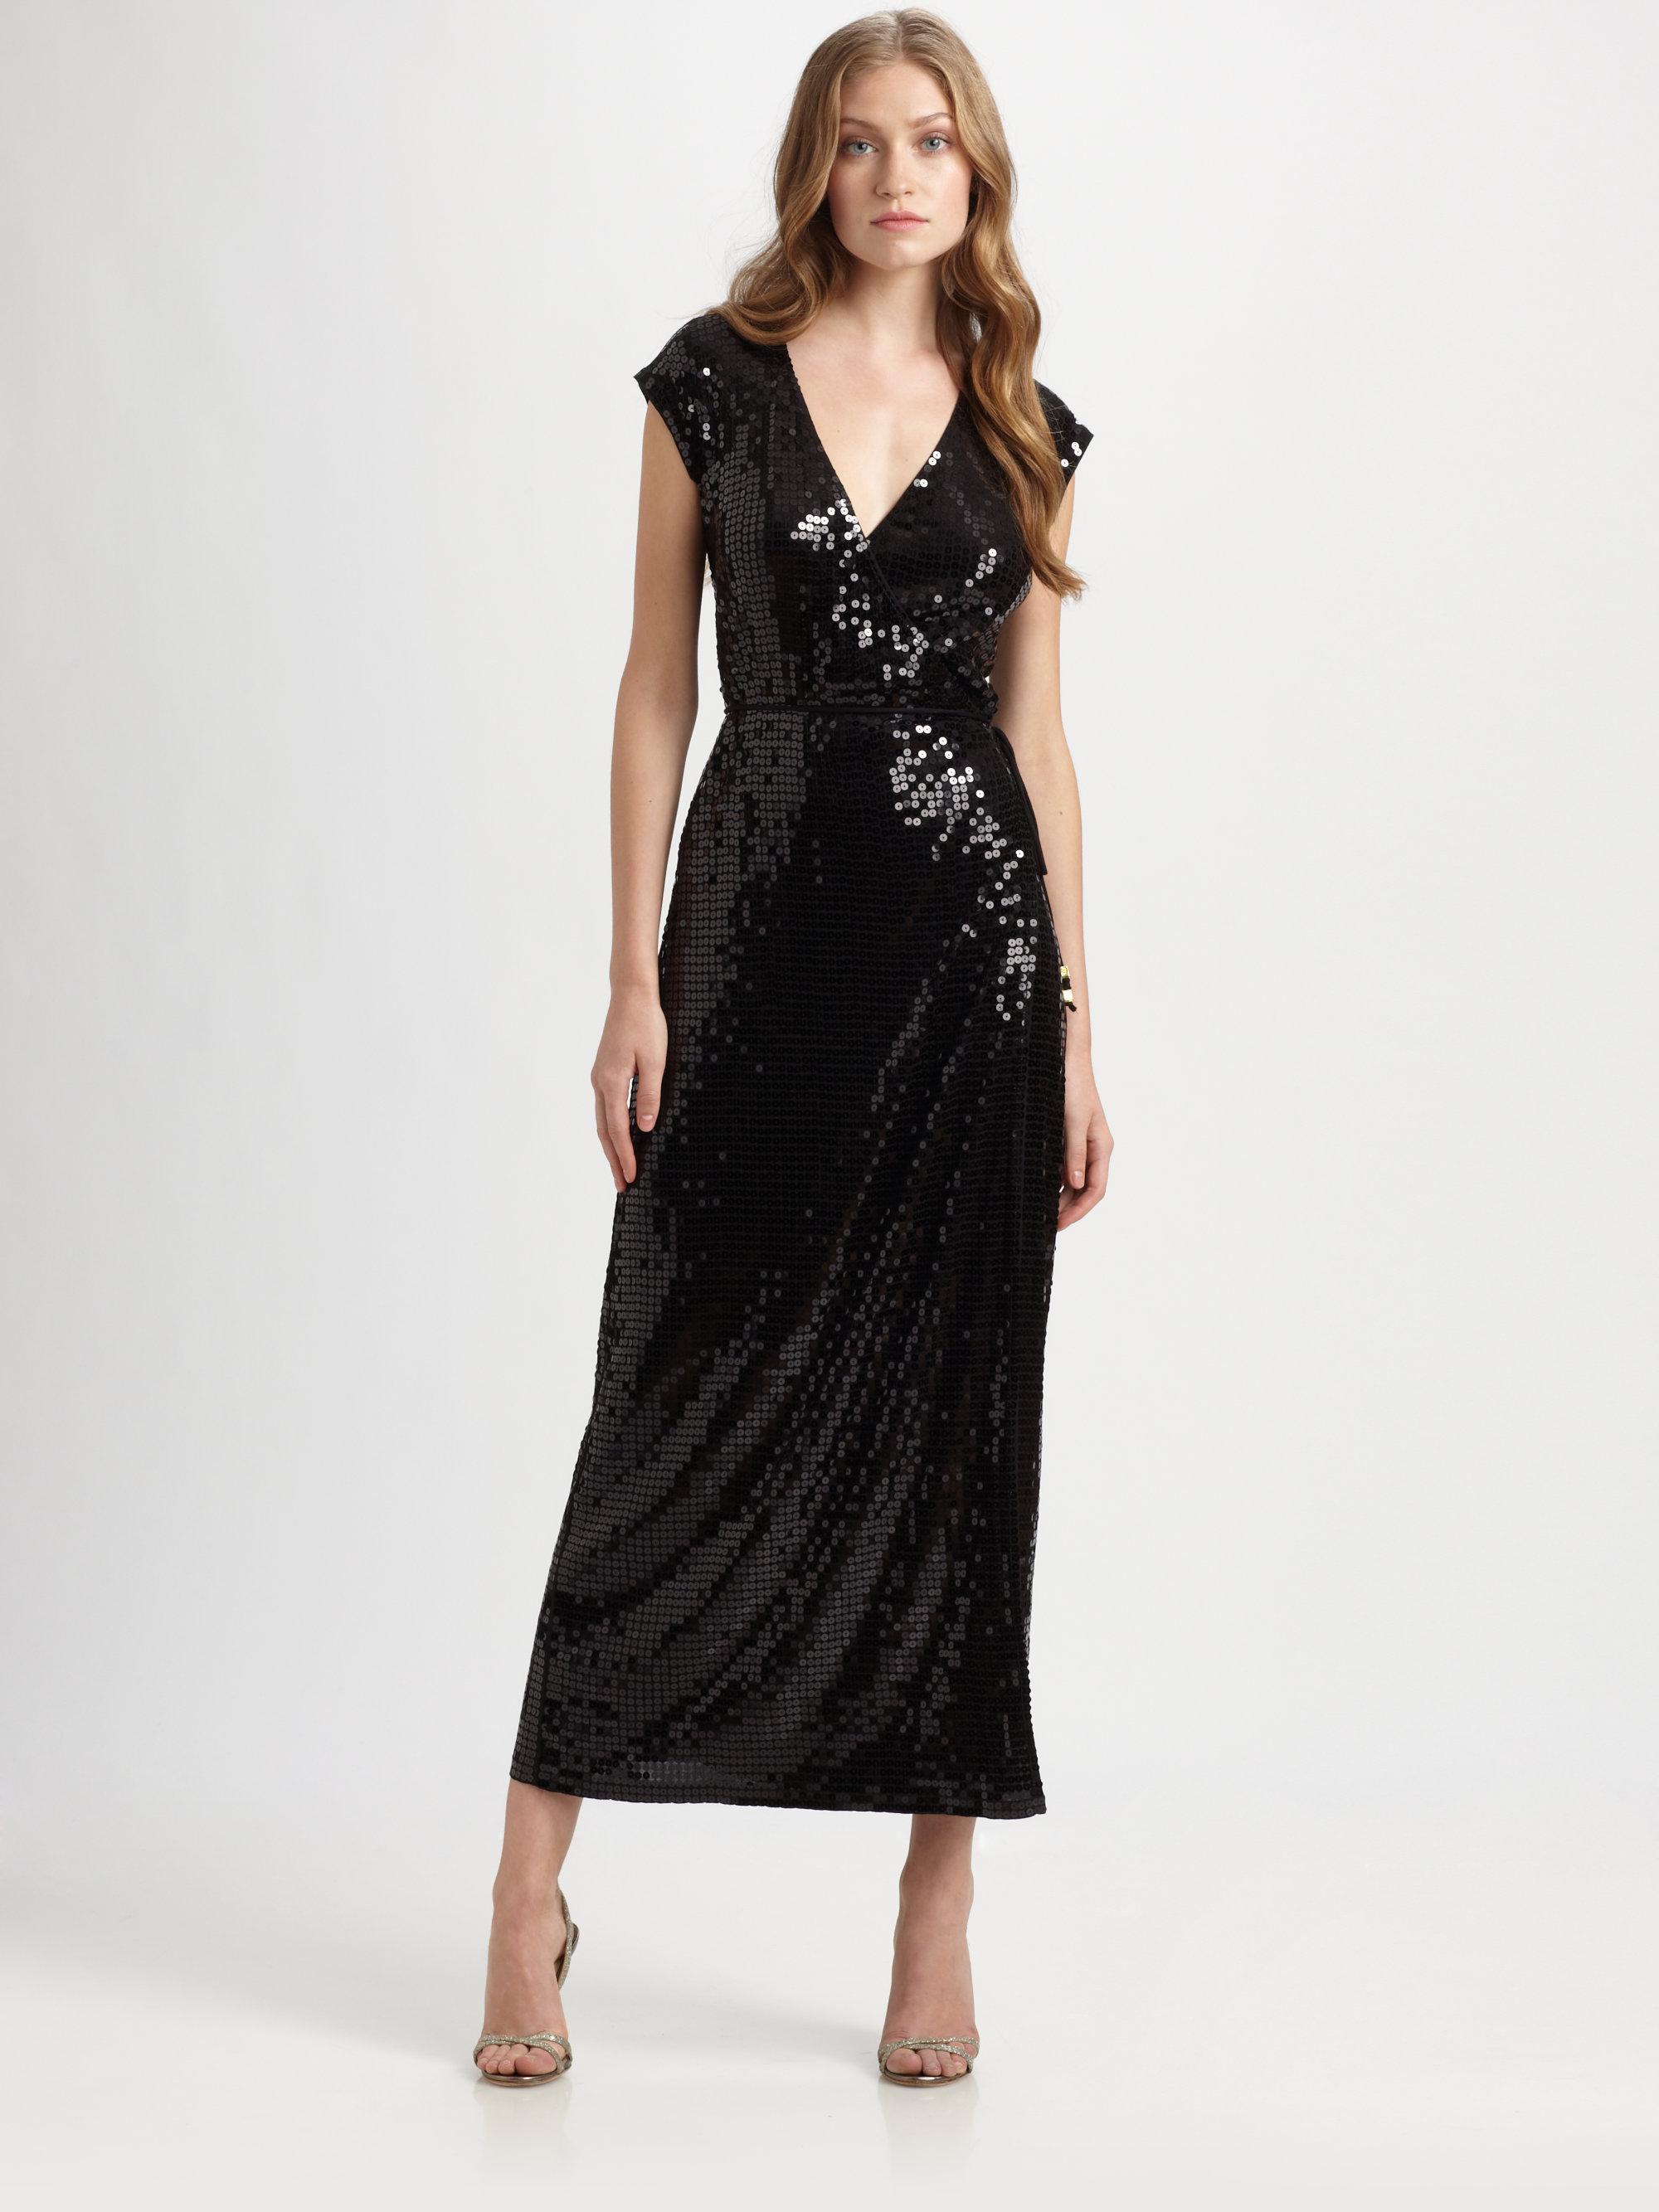 5847b7cf MICHAEL Michael Kors Sequin Wrap Dress in Black - Lyst